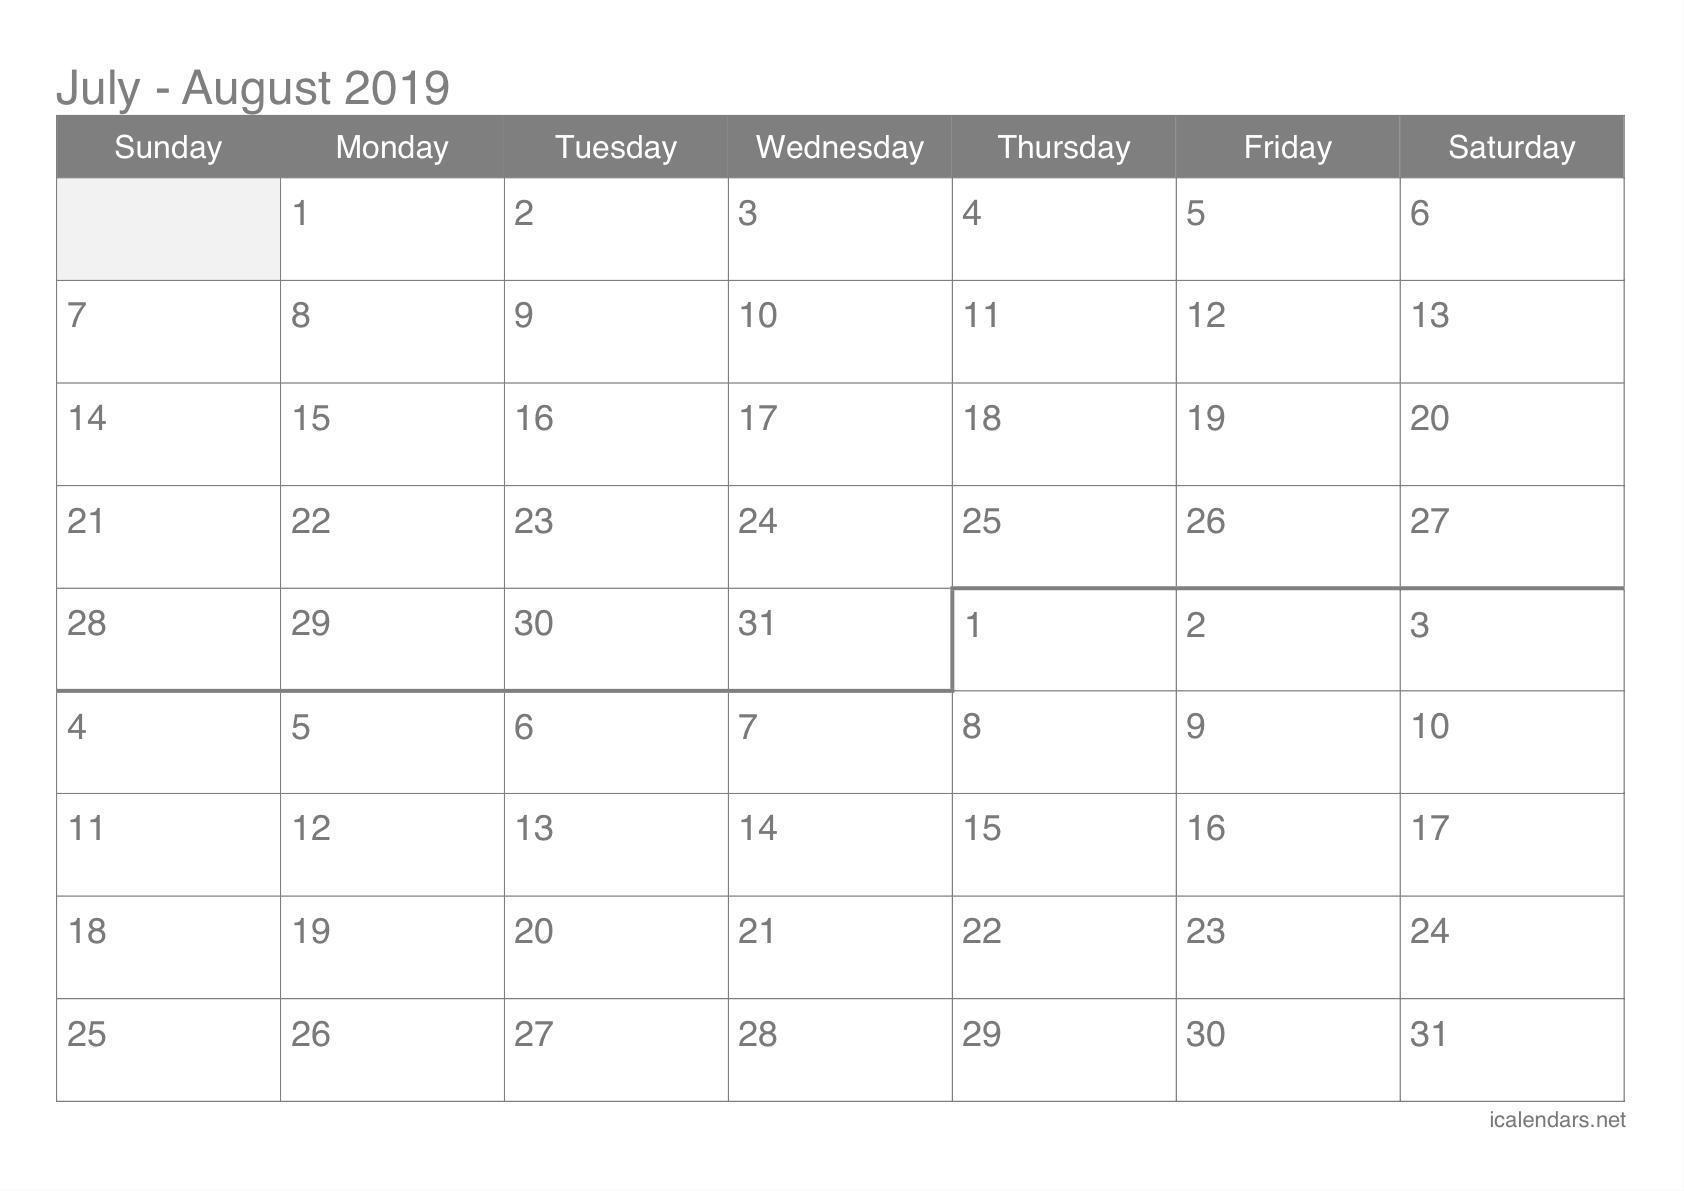 July And August 2019 Printable Calendar – Icalendars Calendar 2019 July August